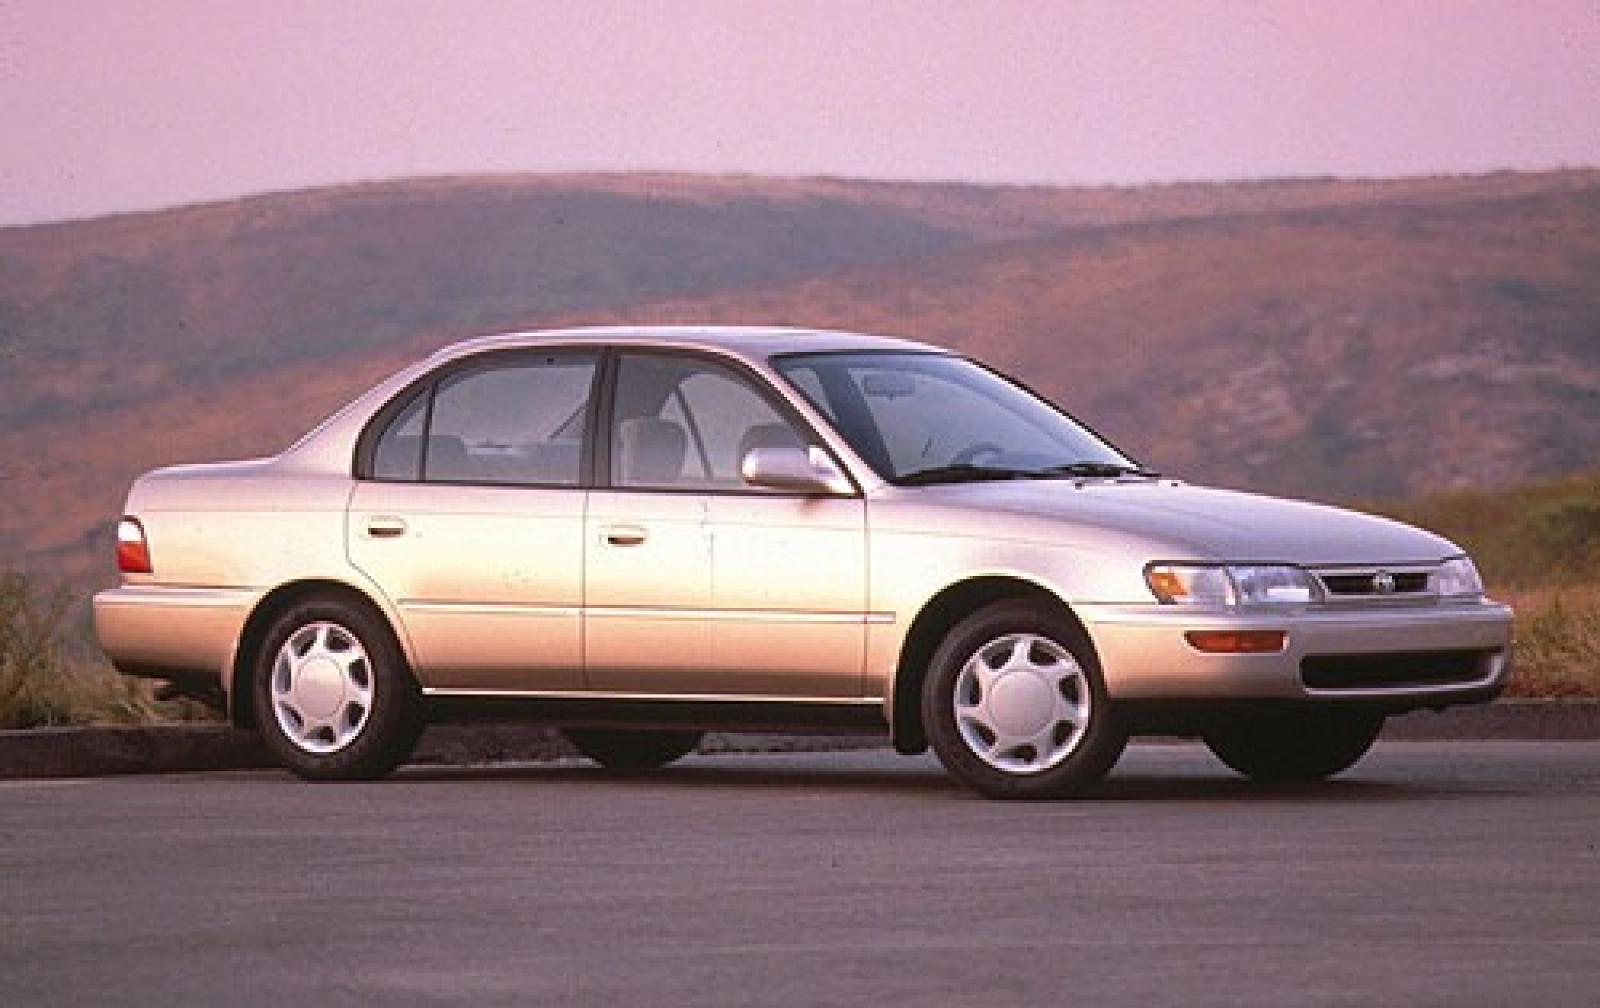 1997 Toyota Corolla Information And Photos Zombiedrive Oem 1996 Honda Civic Ex Sedan Door Wiring Diagram Gallery